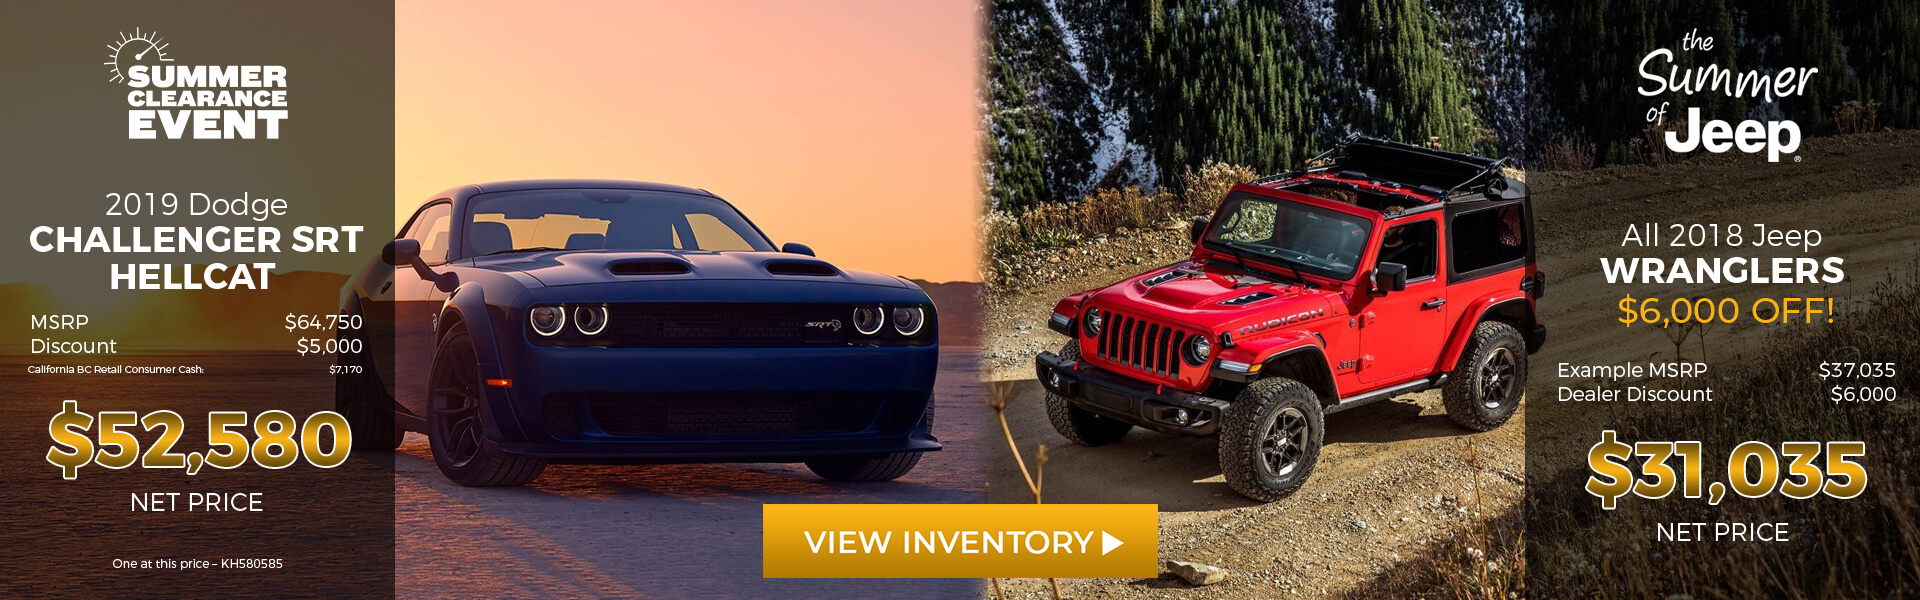 2019 Dodge Challenger/2018 Jeep Wrangler